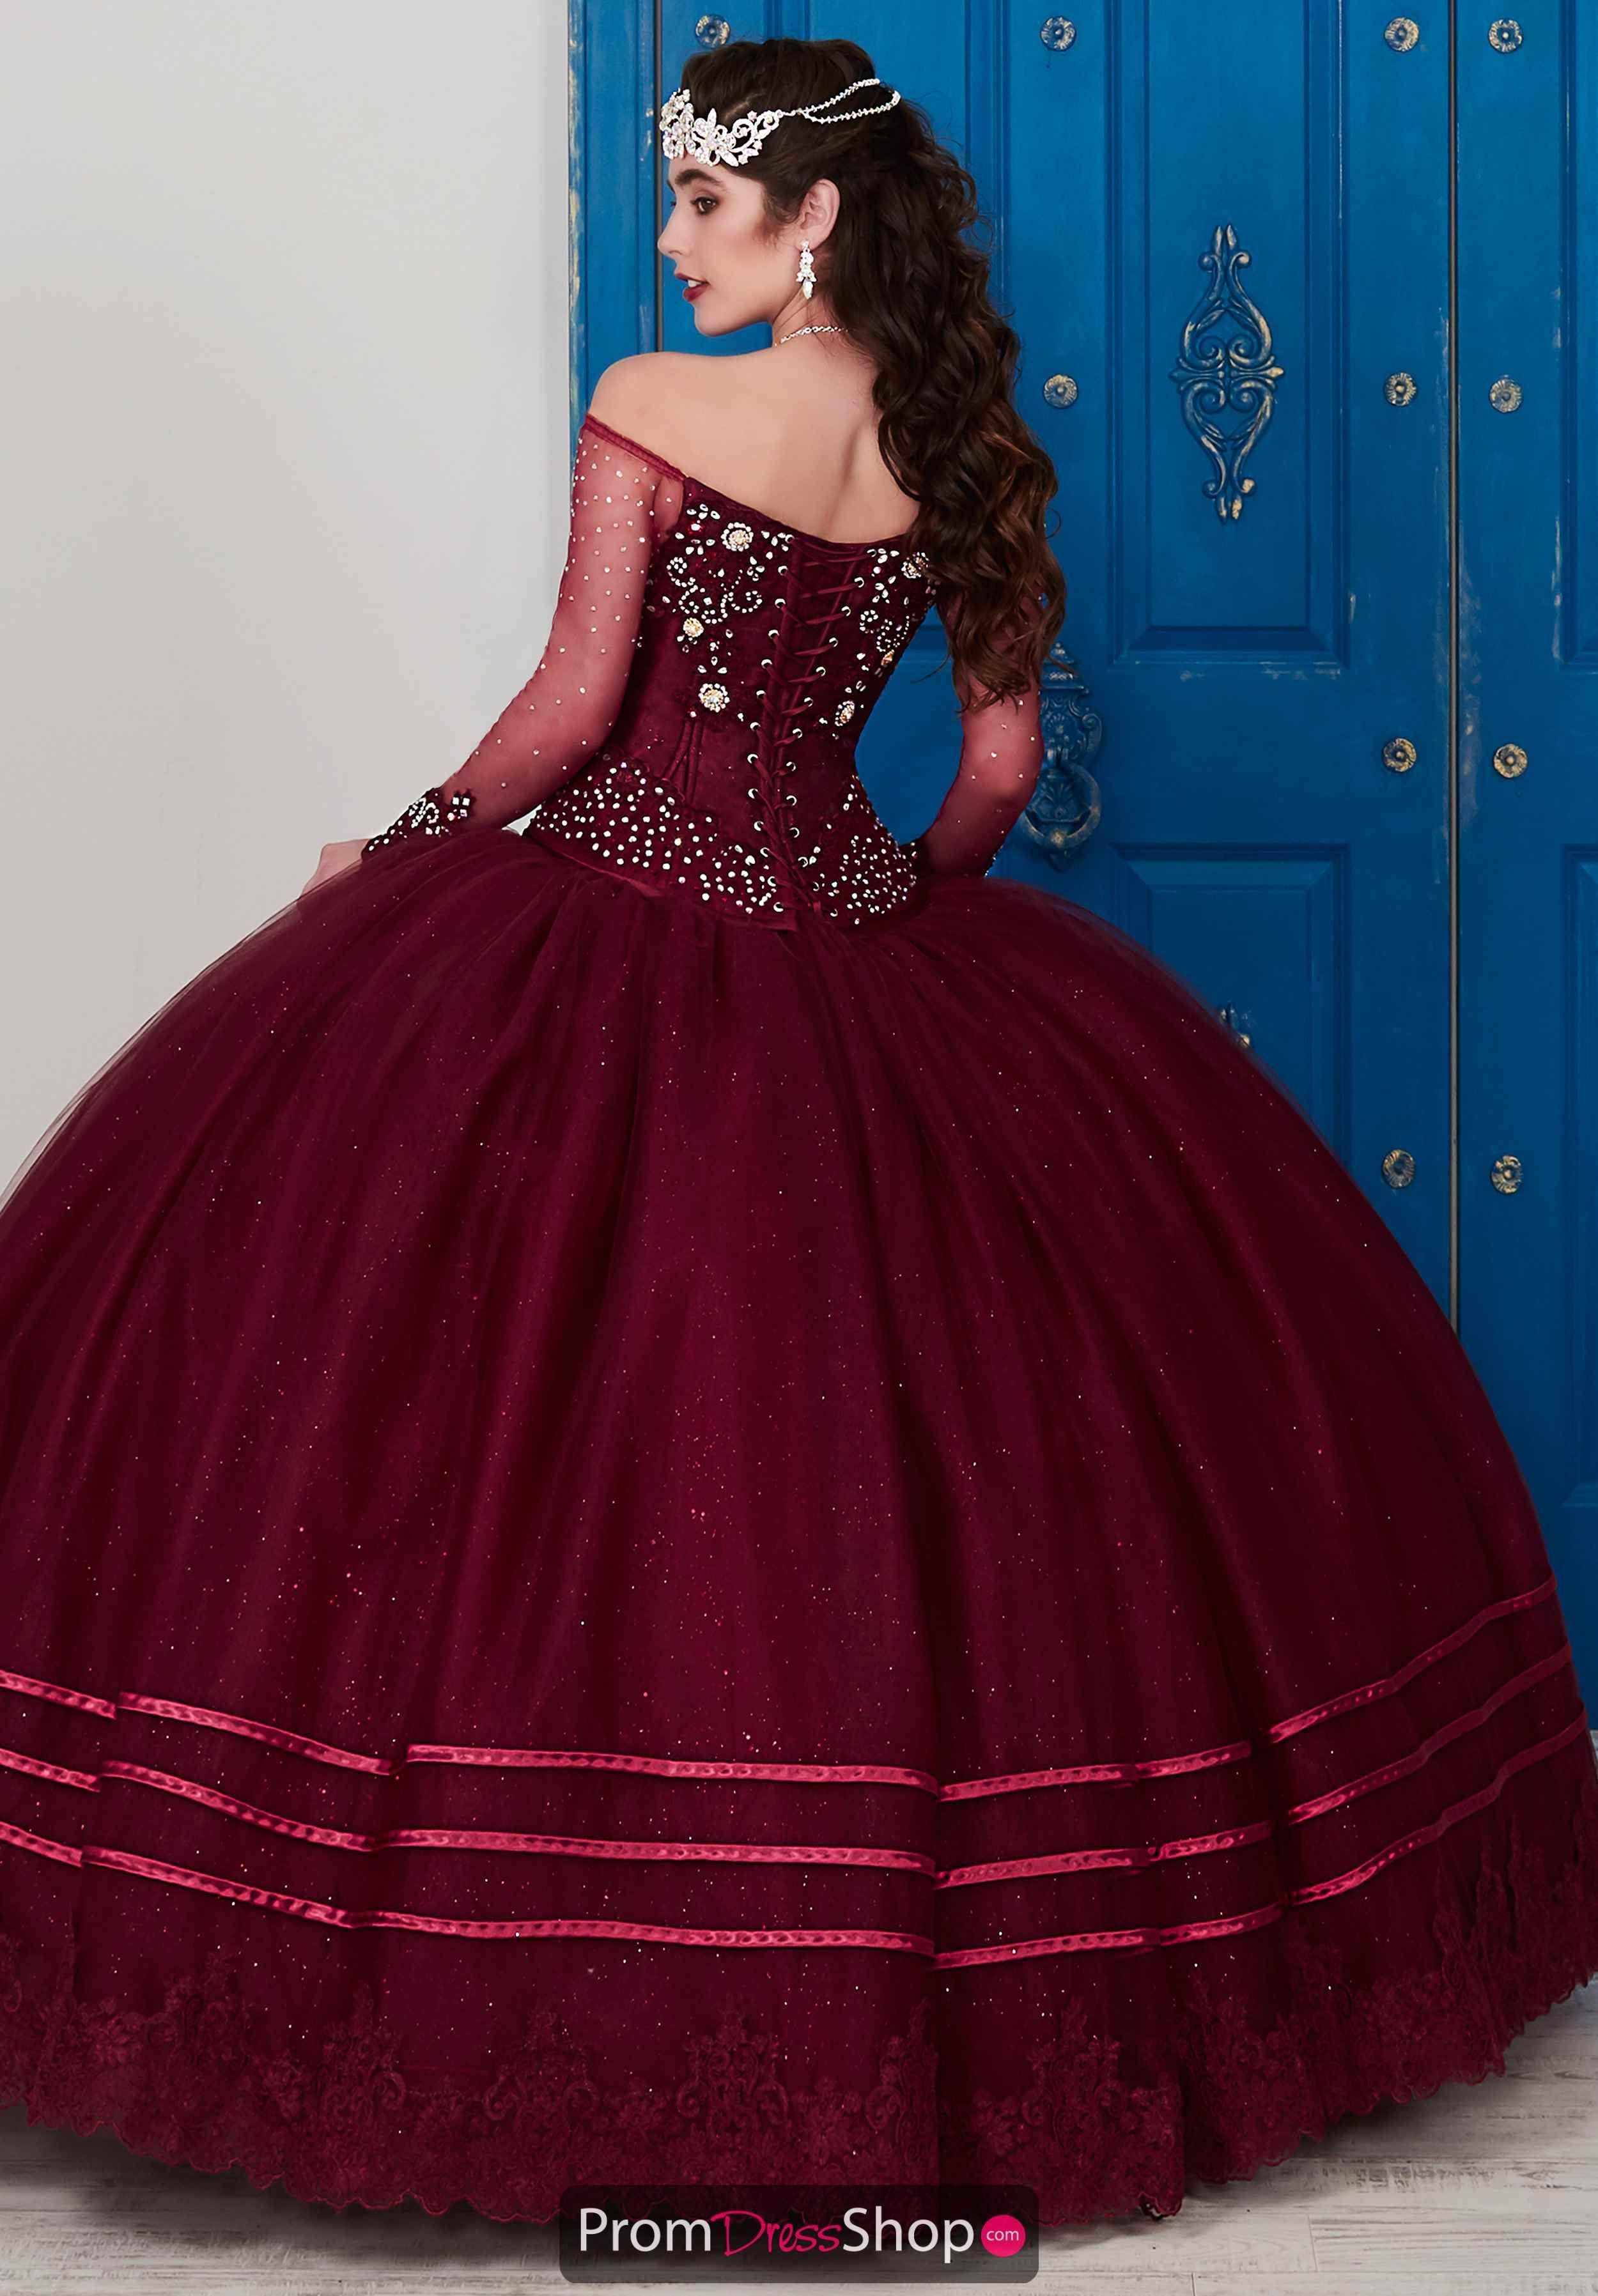 021690f89e6e Romantic Long Sleeve Tiffany Quince Dress 24039 in 2019